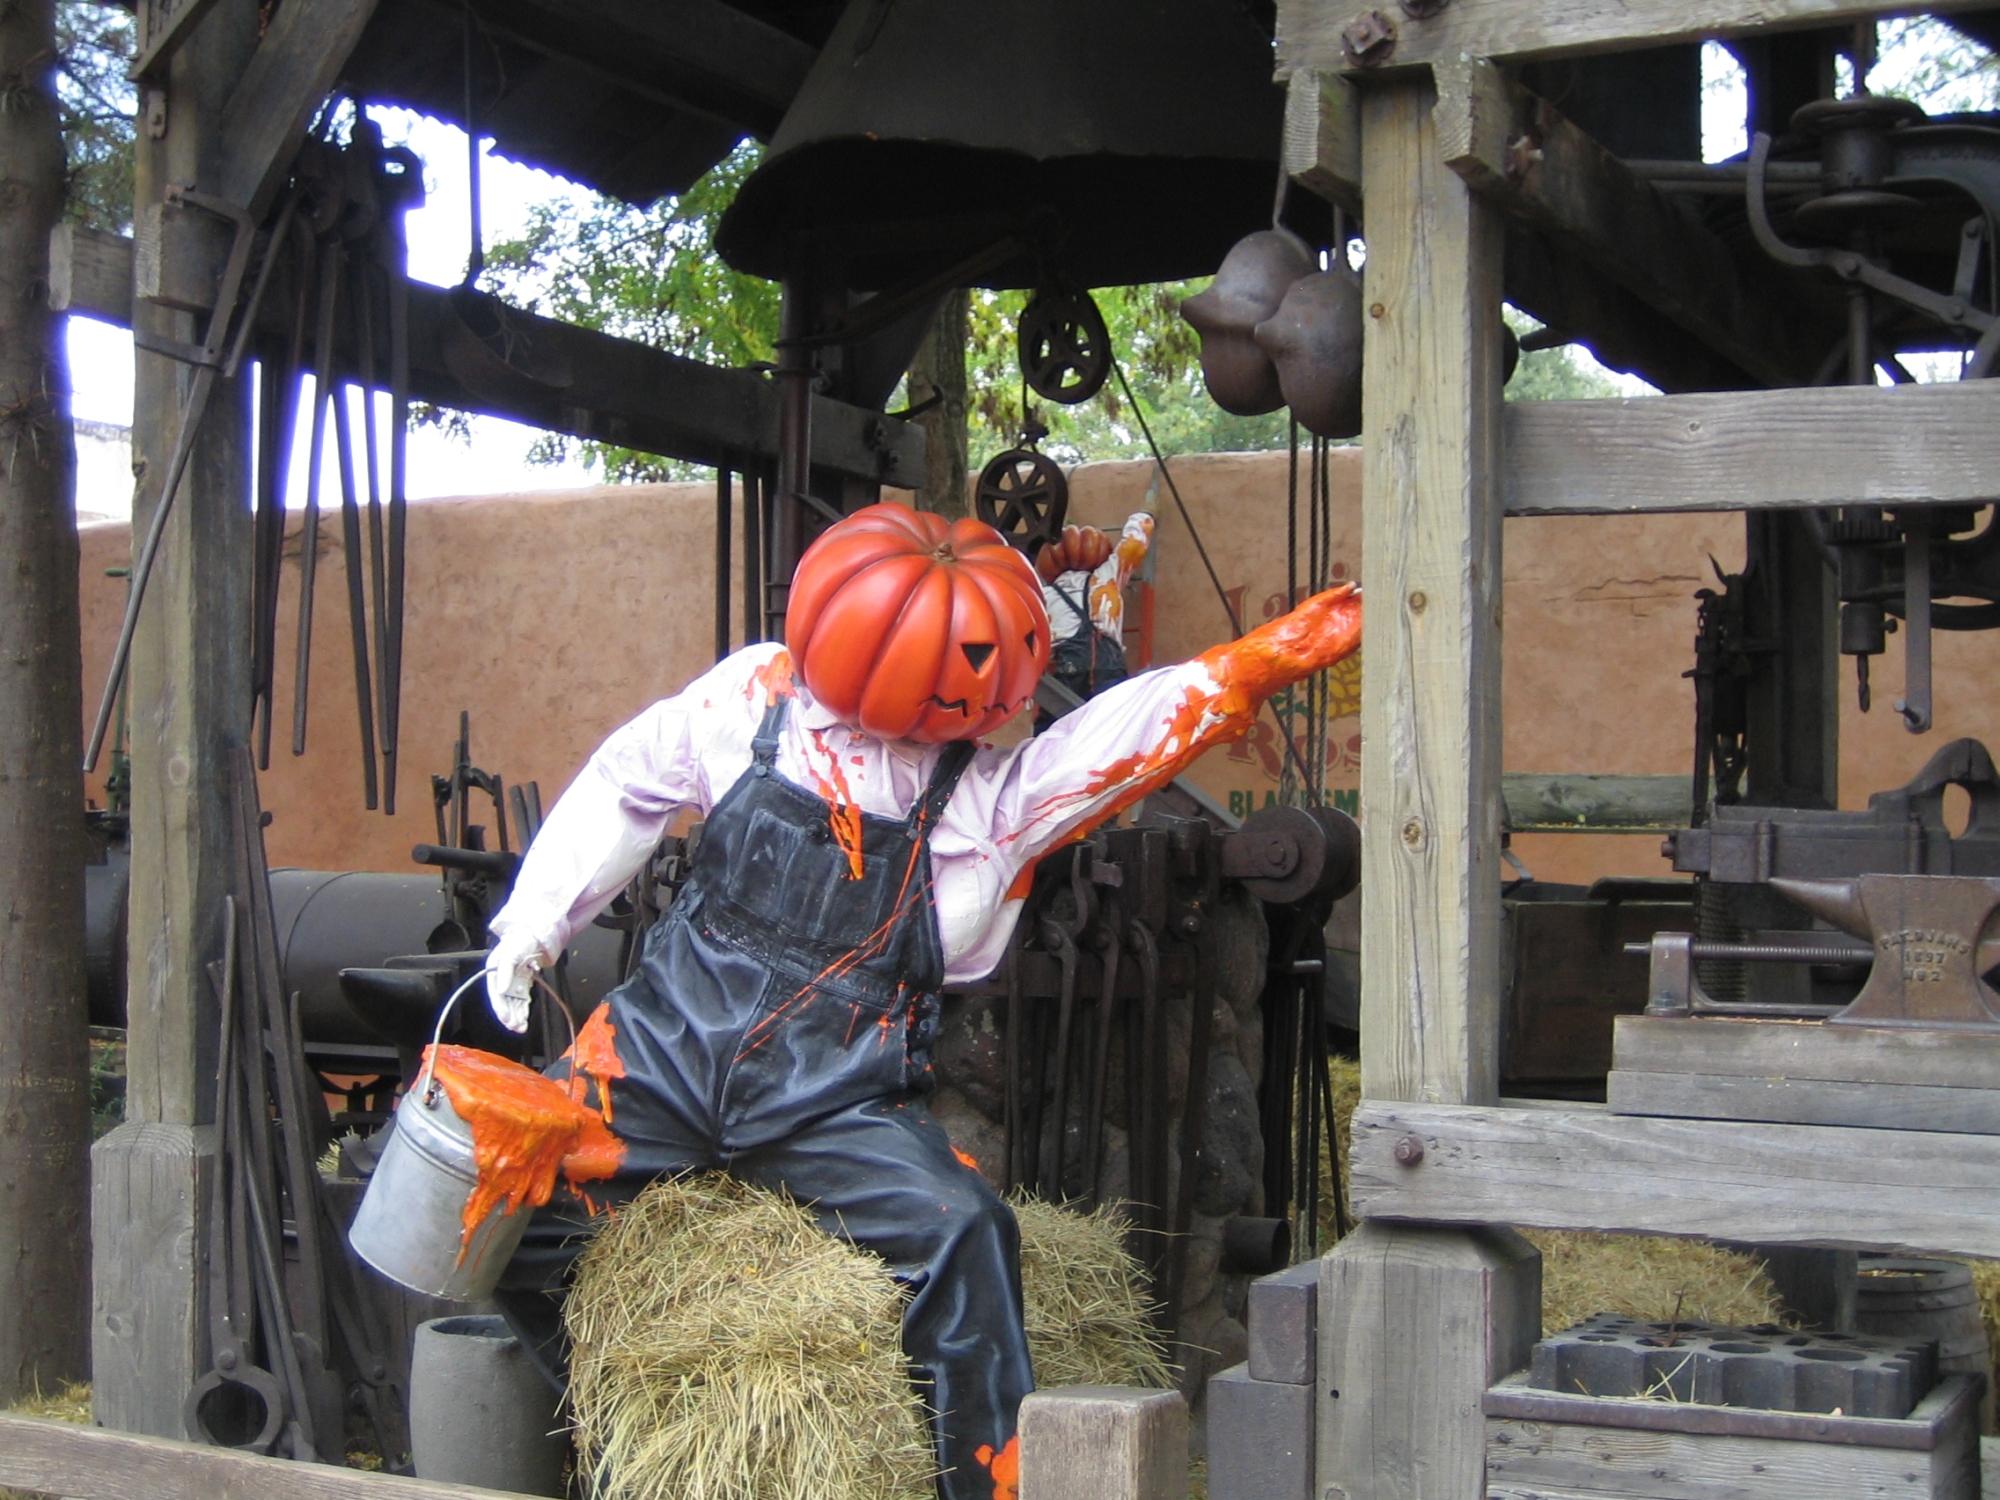 Enjoy Halloween fun at Disney Parks around the world! |PassPorter.com